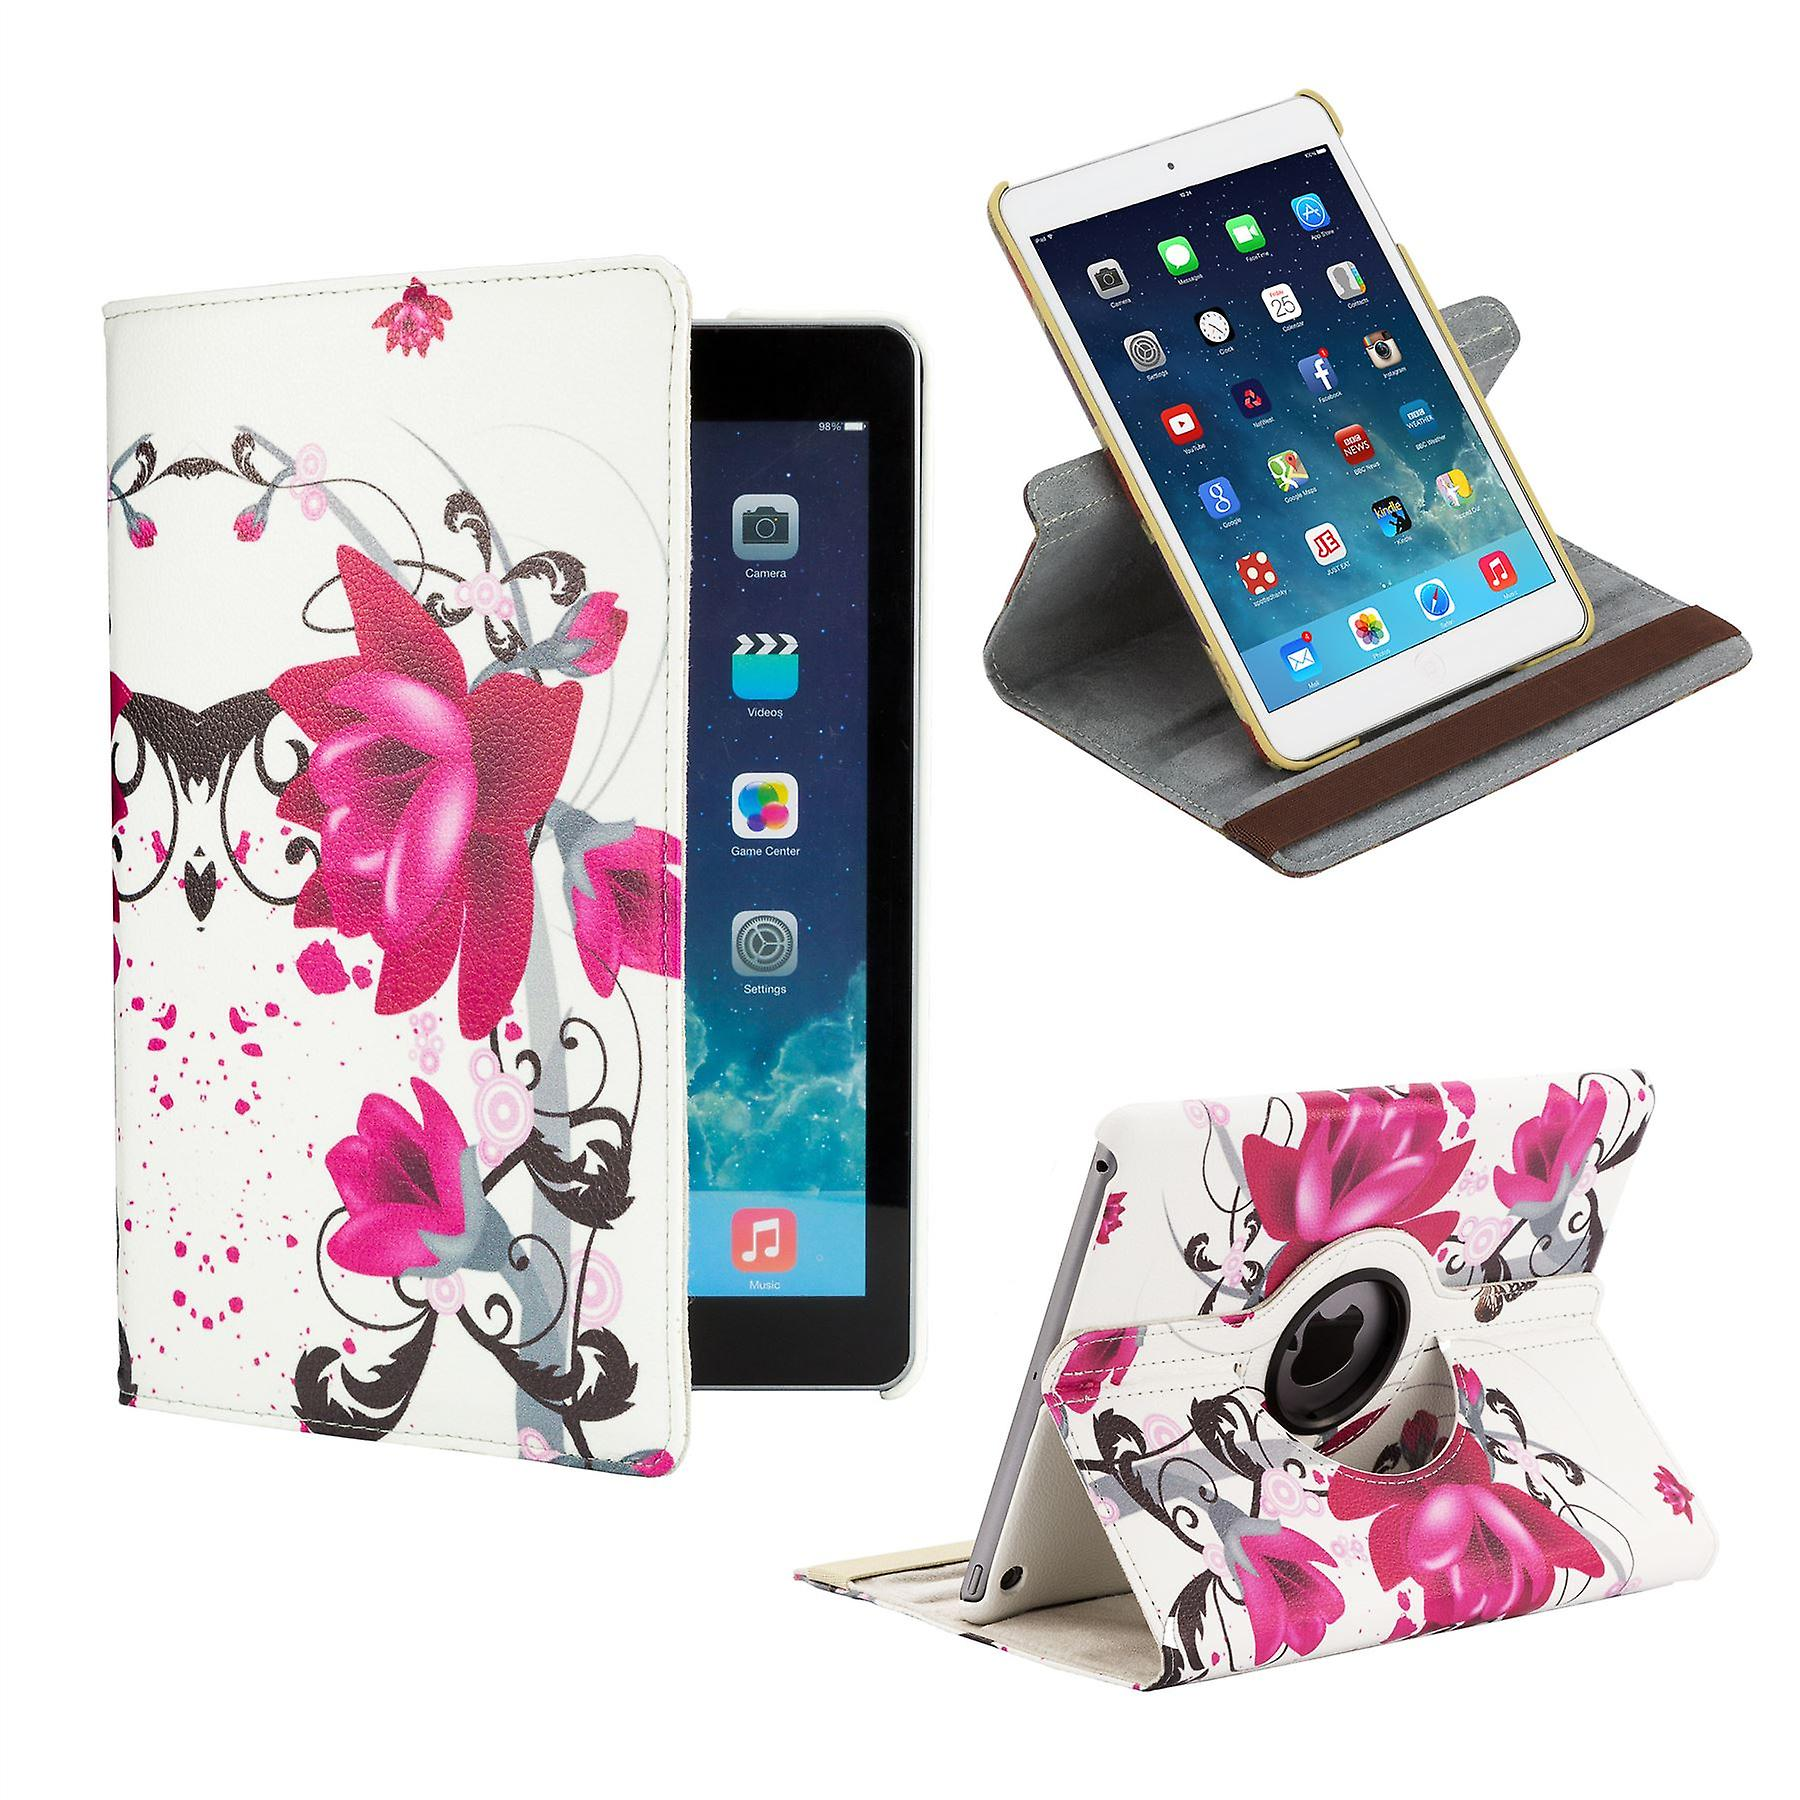 360 degree Design Book case for Apple iPad Mini 4th Gen - Purple Rose